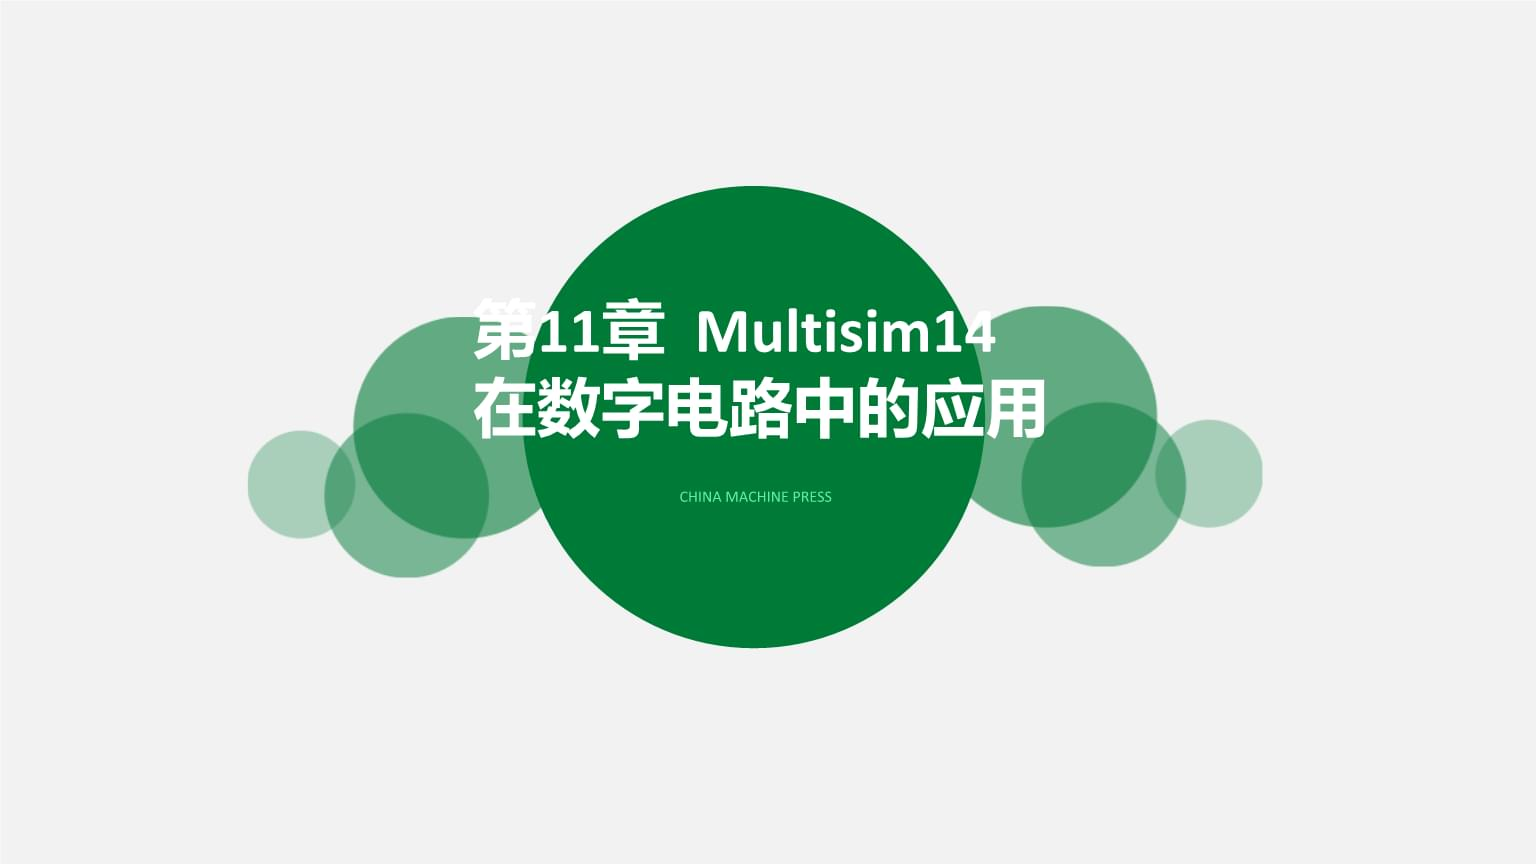 Multisim14电子系统仿真与设计第11章  Multisim14在数字电路中的应用.ppt